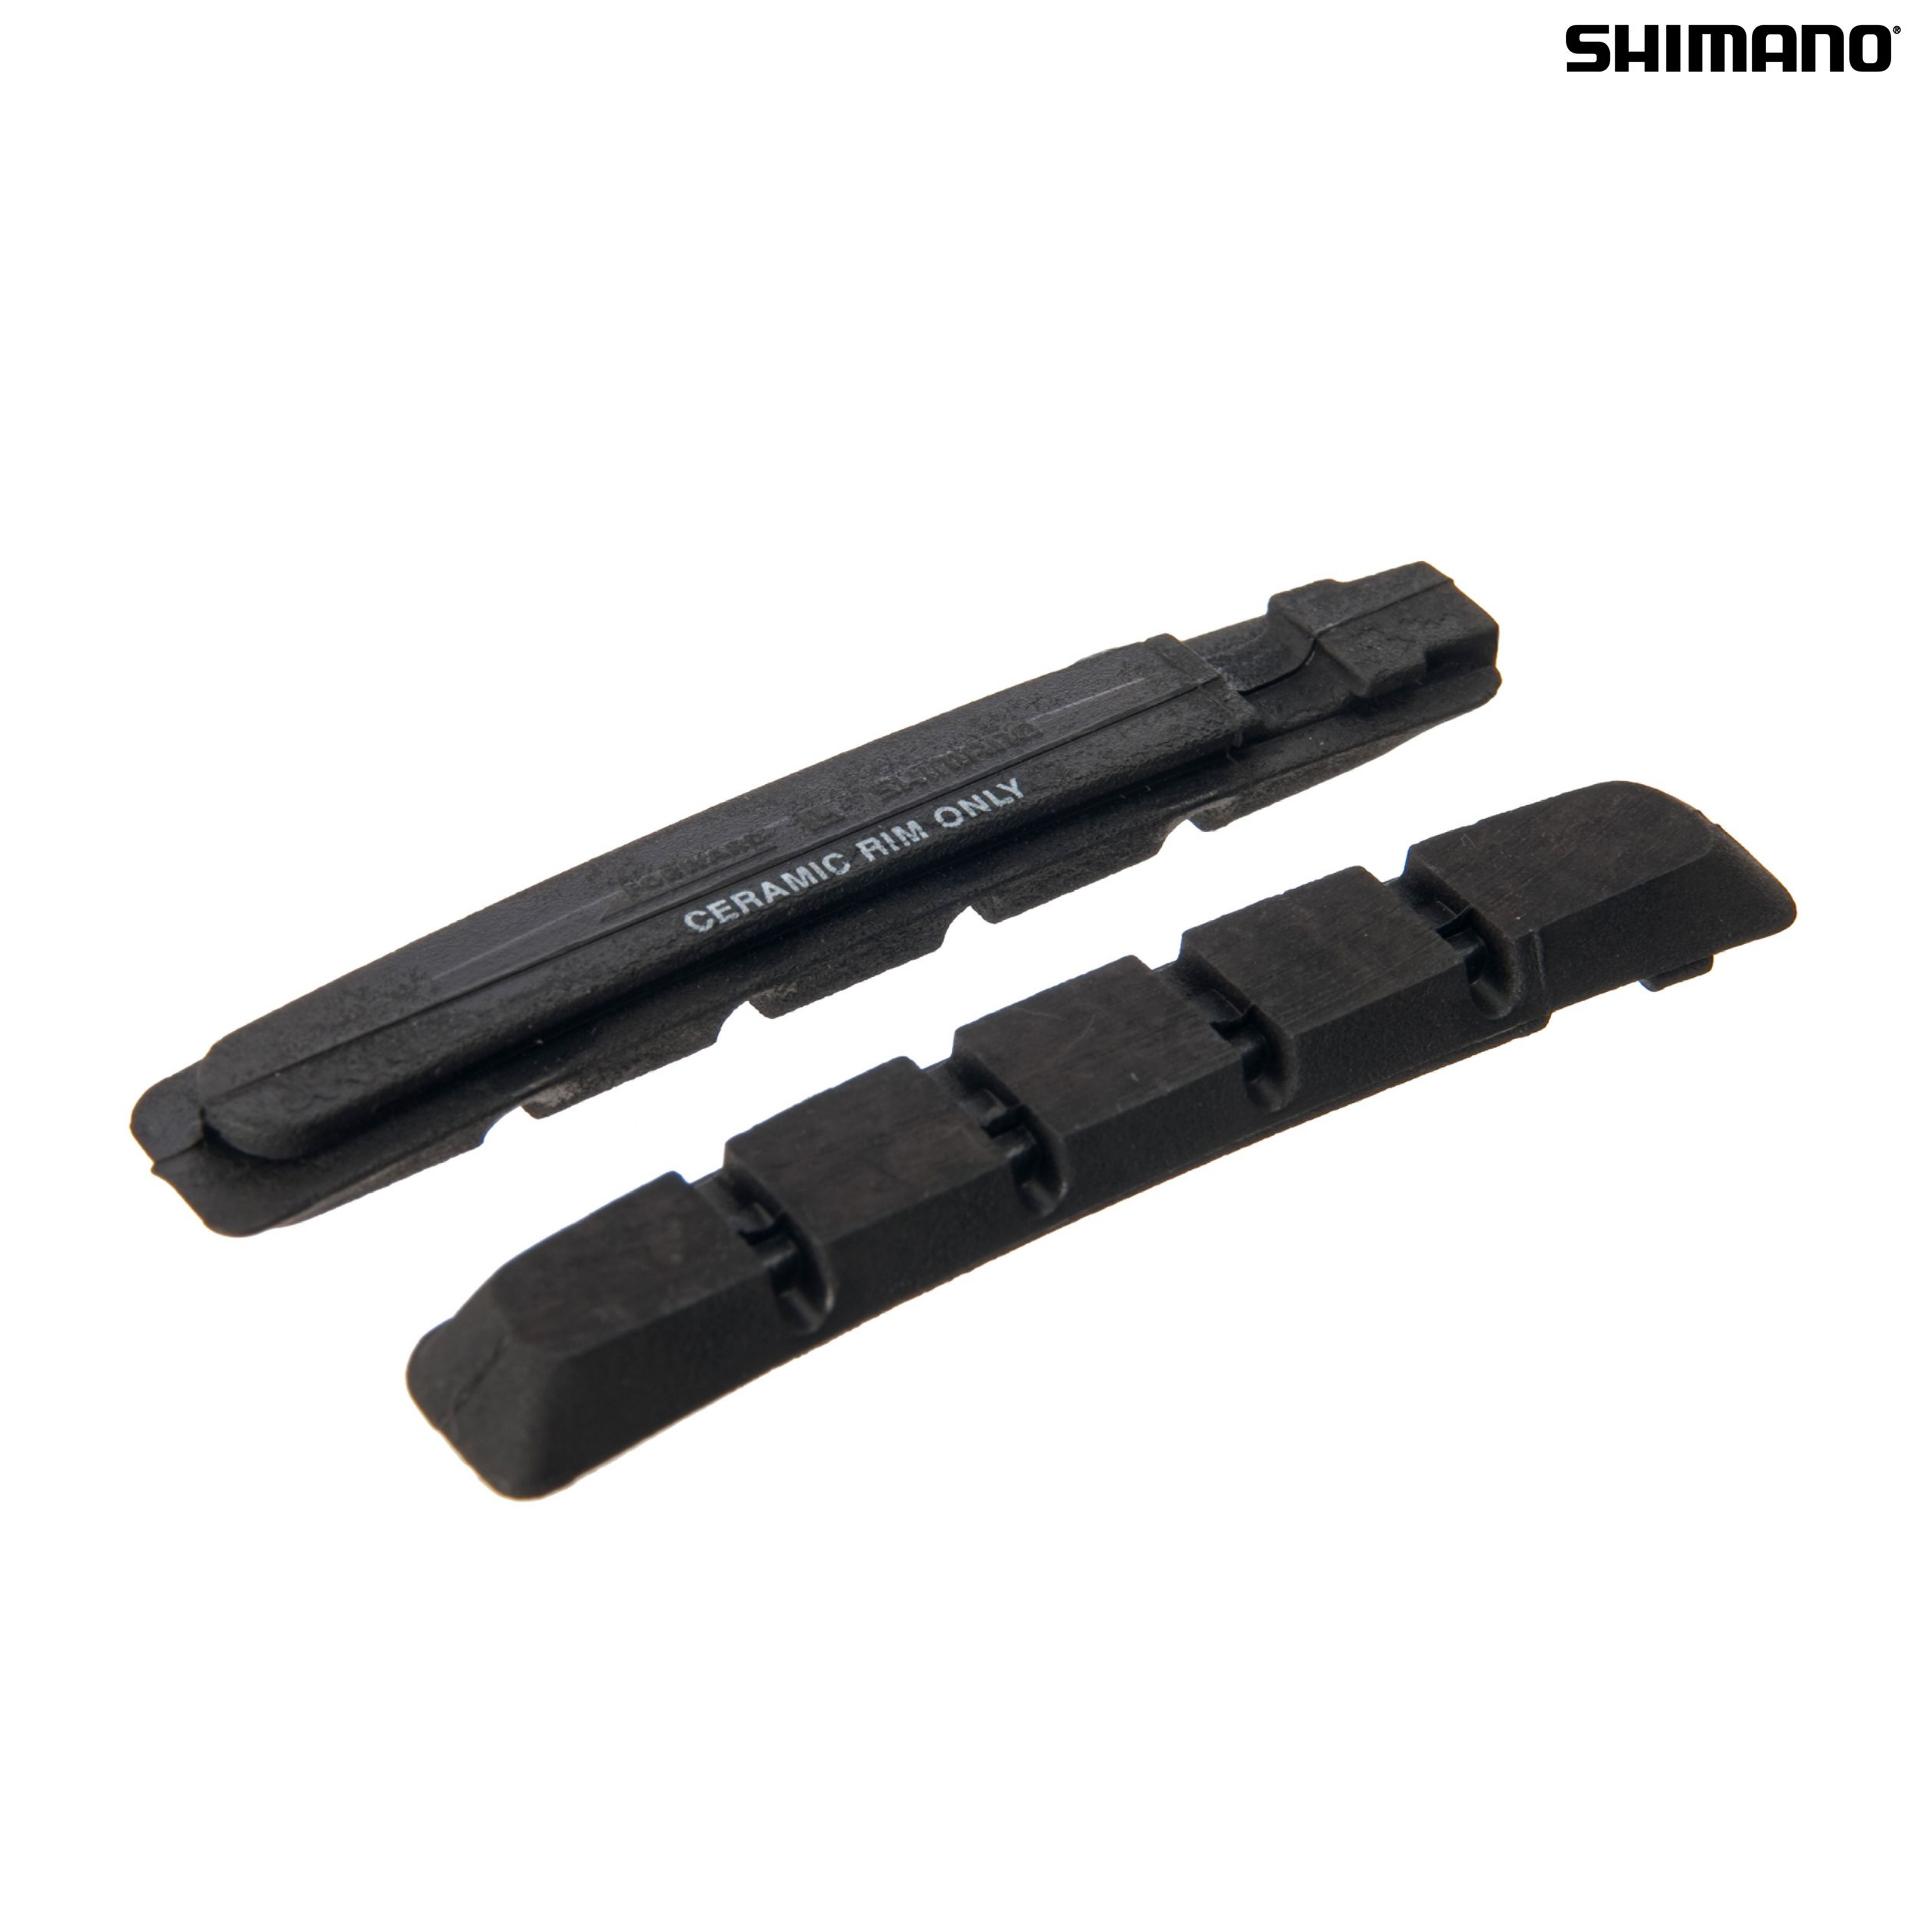 SHIMANO BR-M970 CARTRIDGE BRAKE SHOE BLOCK NEW Y8AA98040